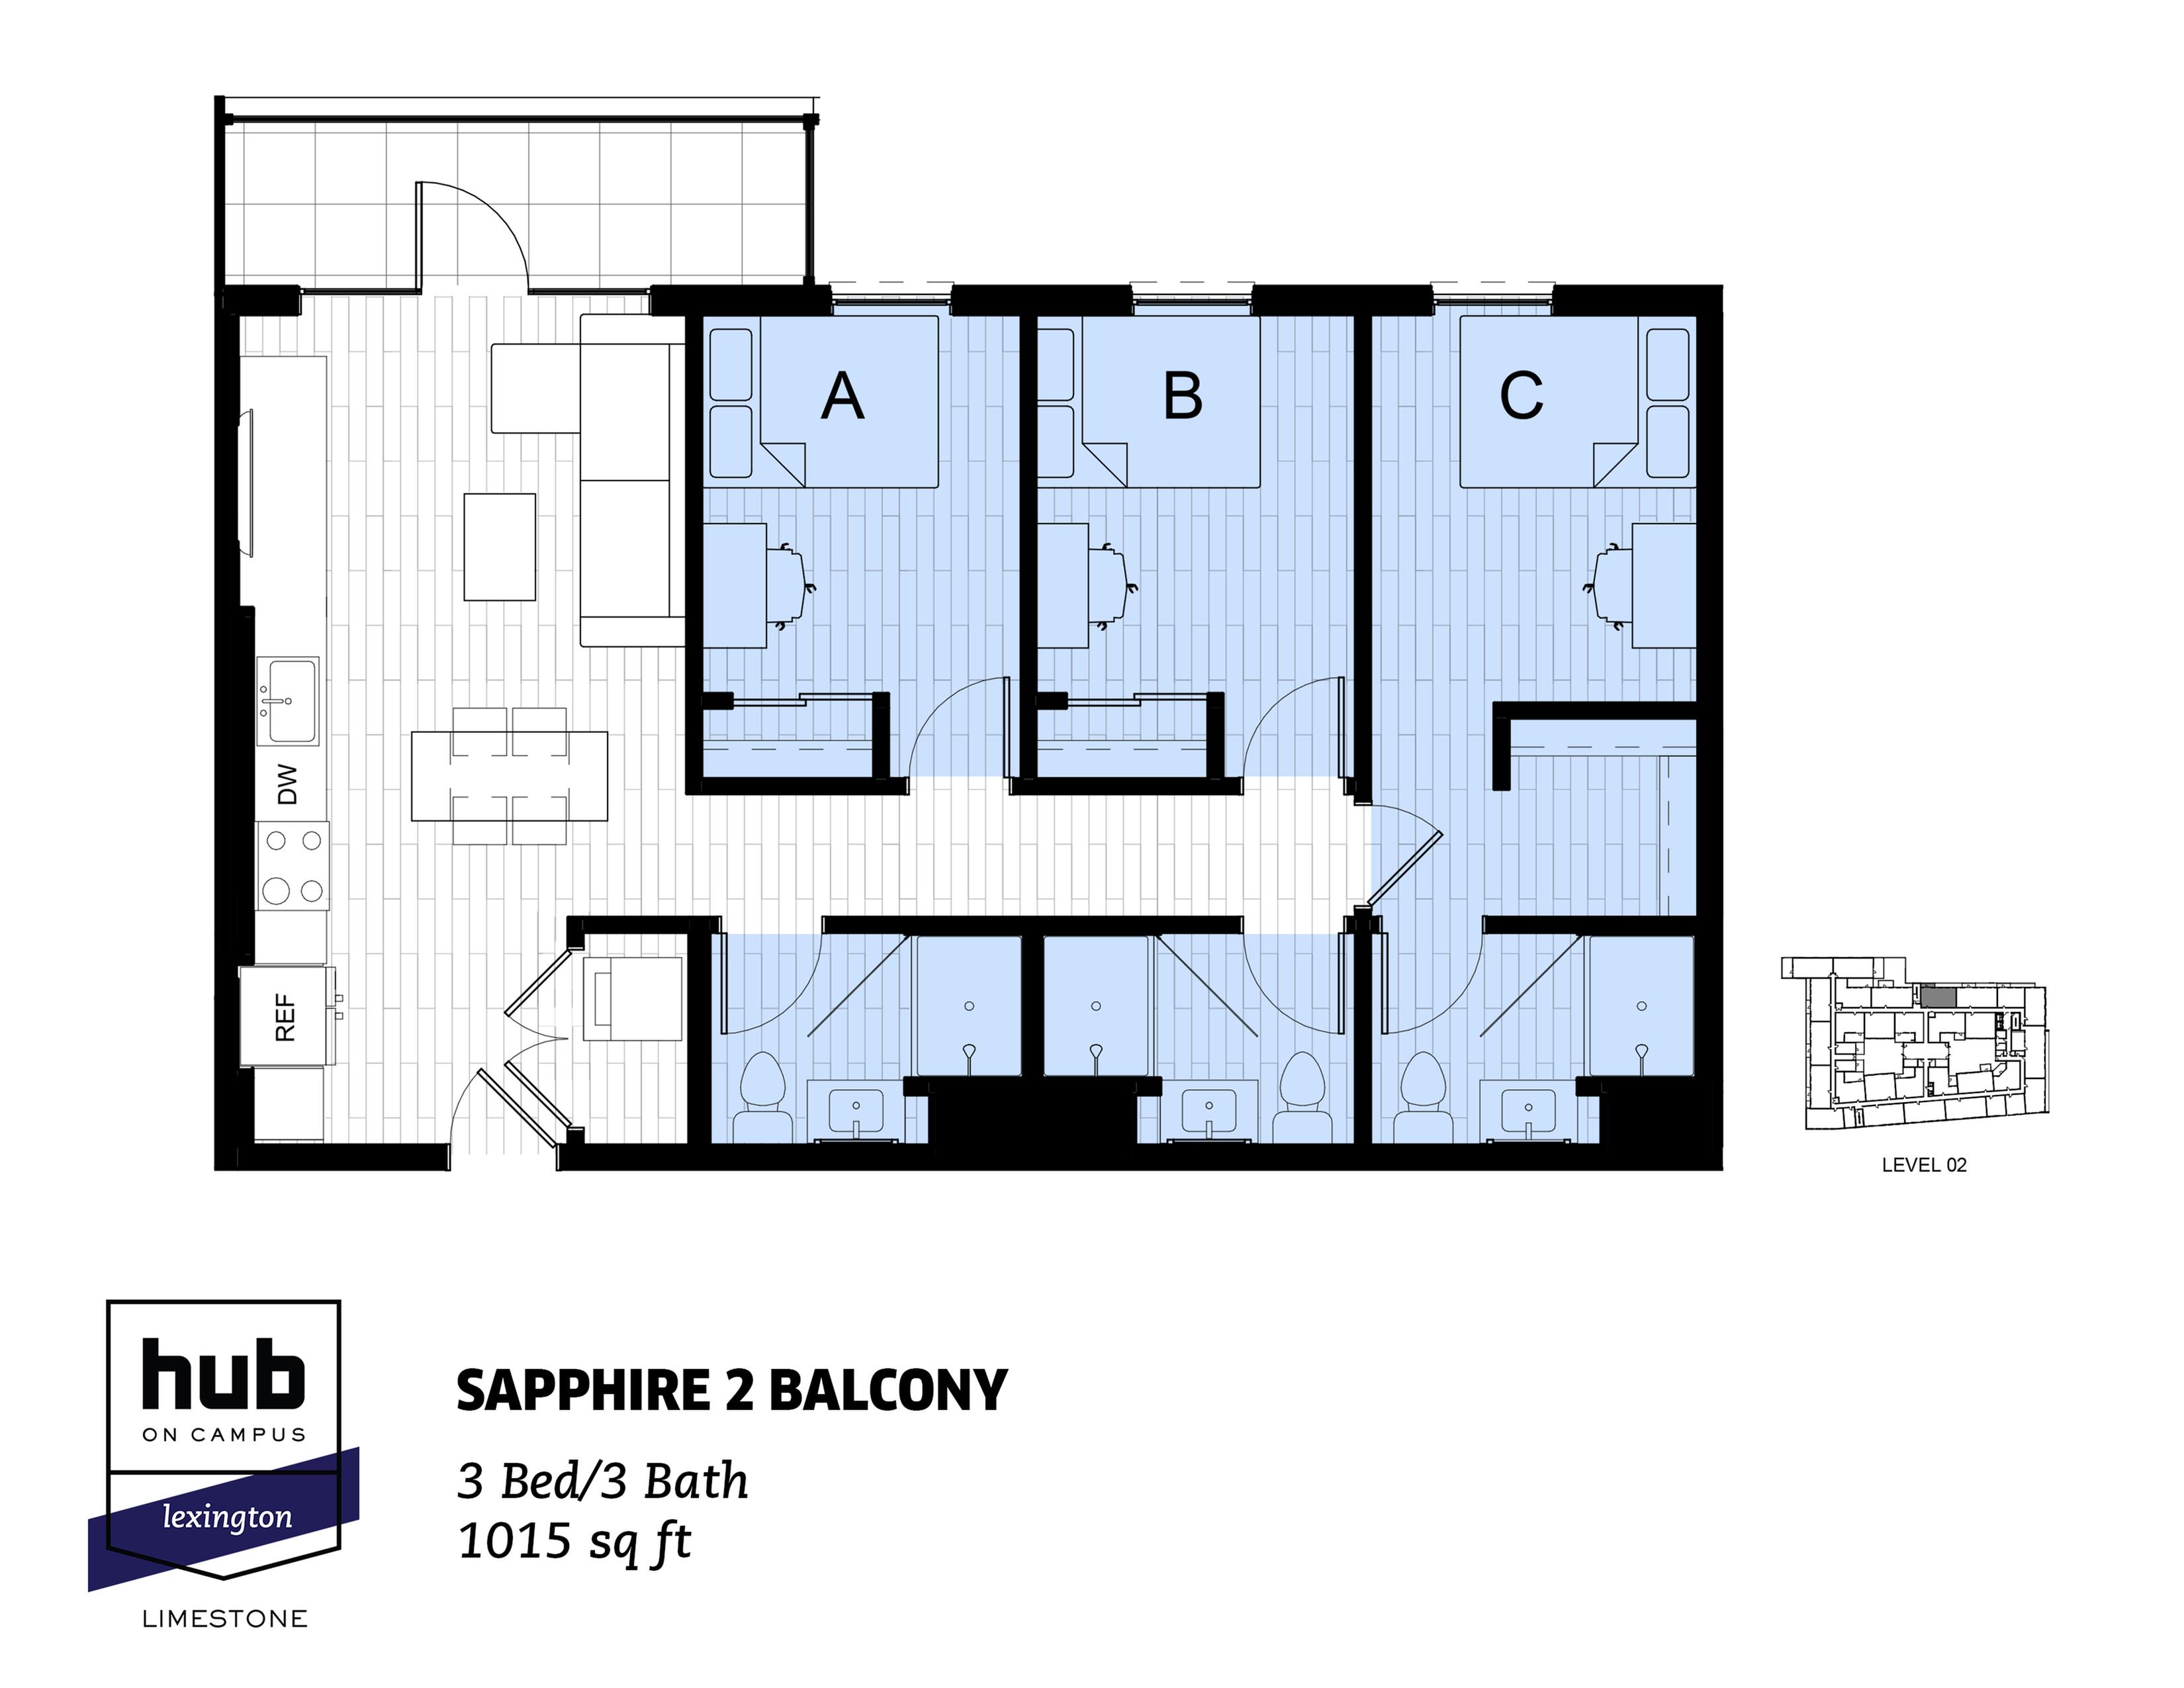 Sapphire 2 Balcony